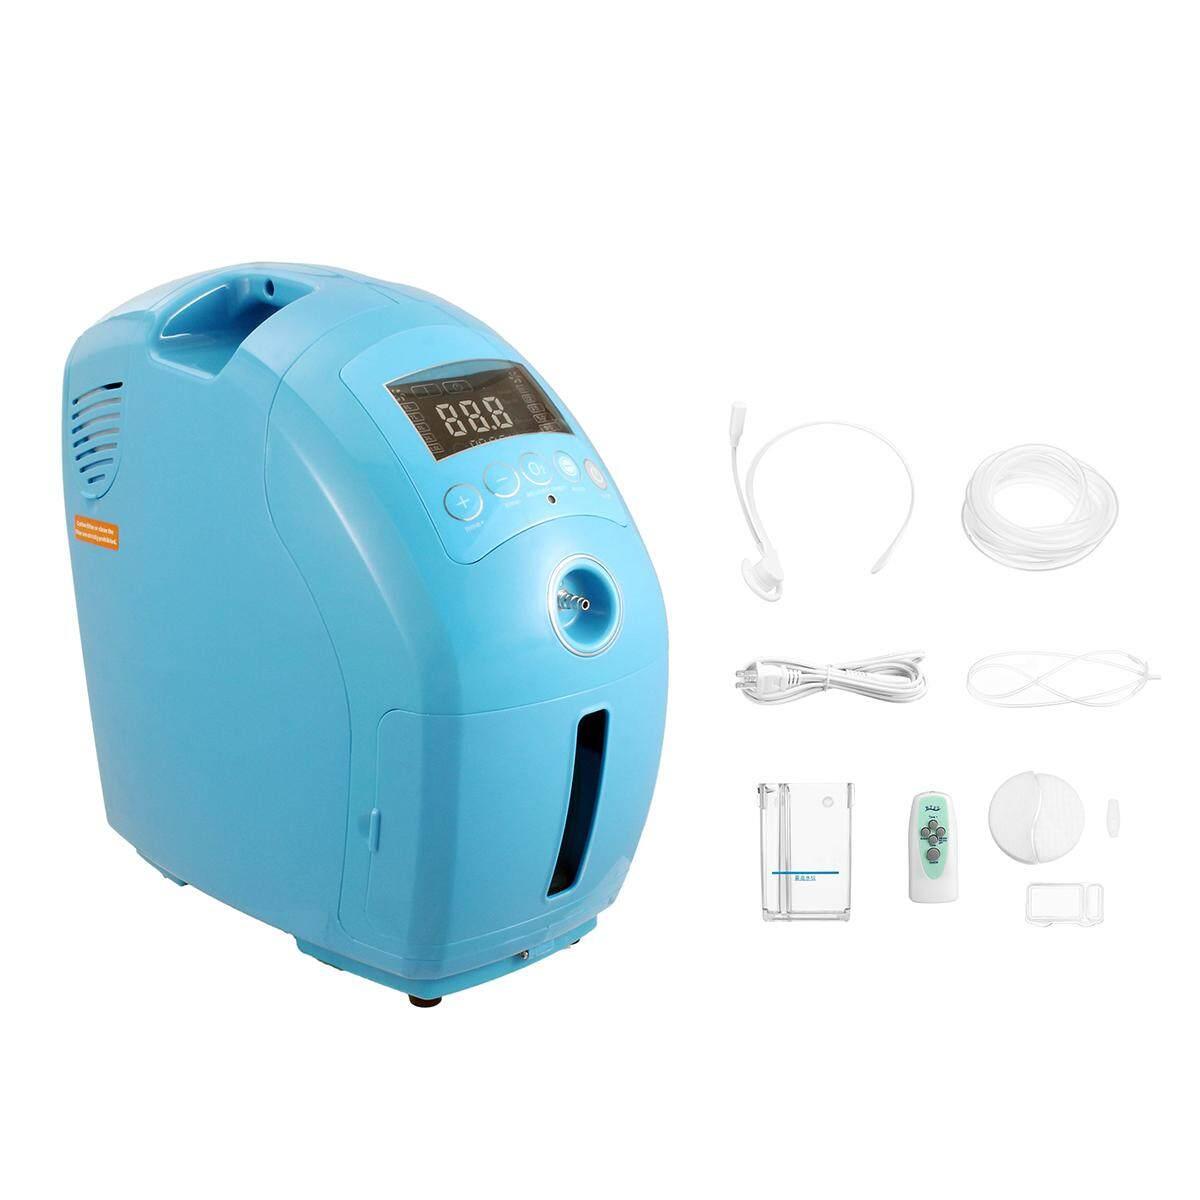 220V high-end intelligent spray oxygen concentrator MAF006A-4 1.5-9L